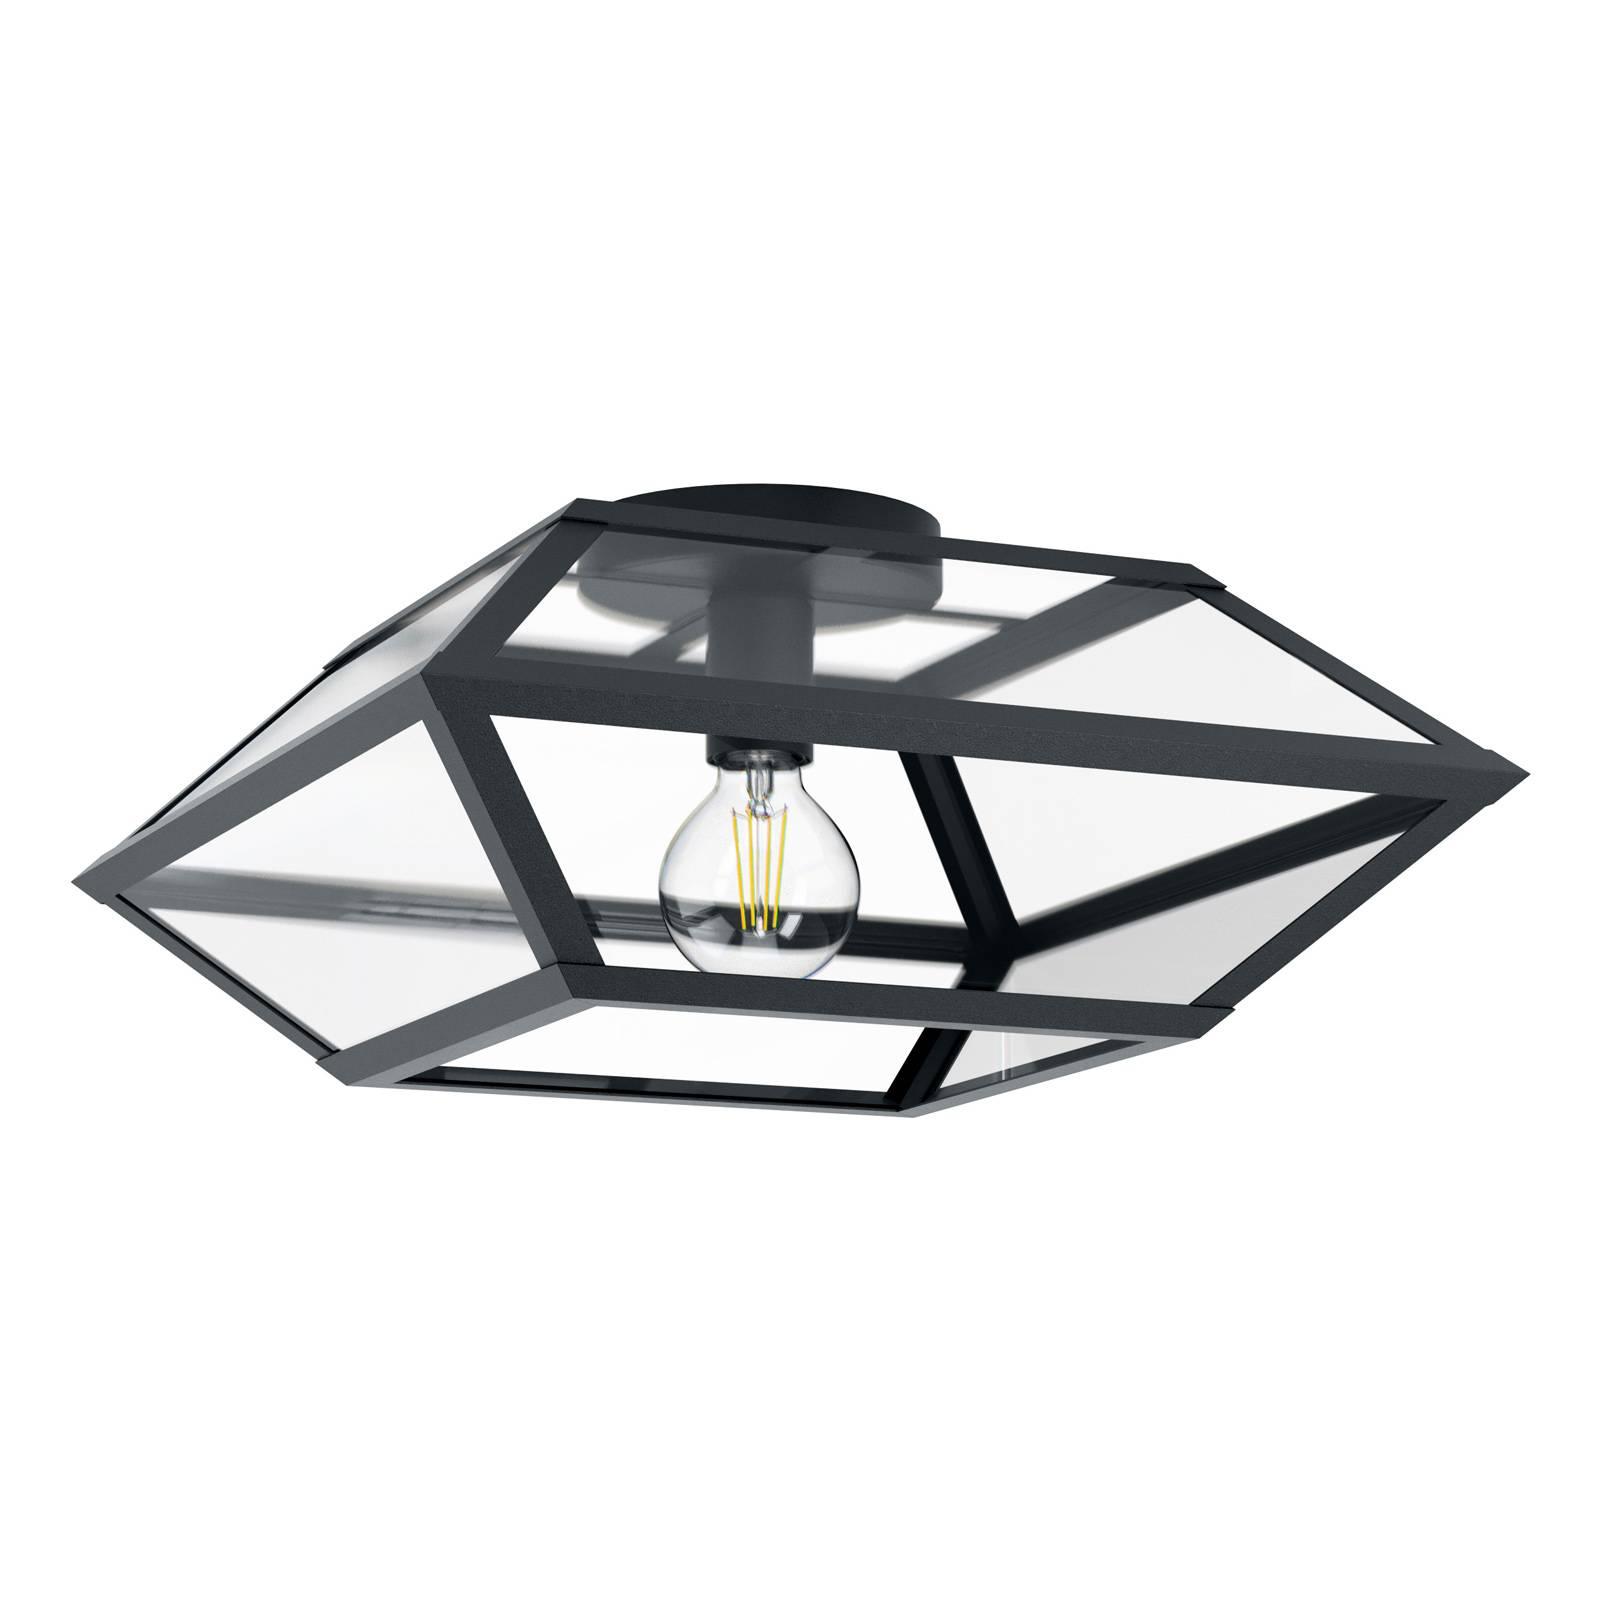 Lampa sufitowa Casefabre ze stali, 45x45 cm